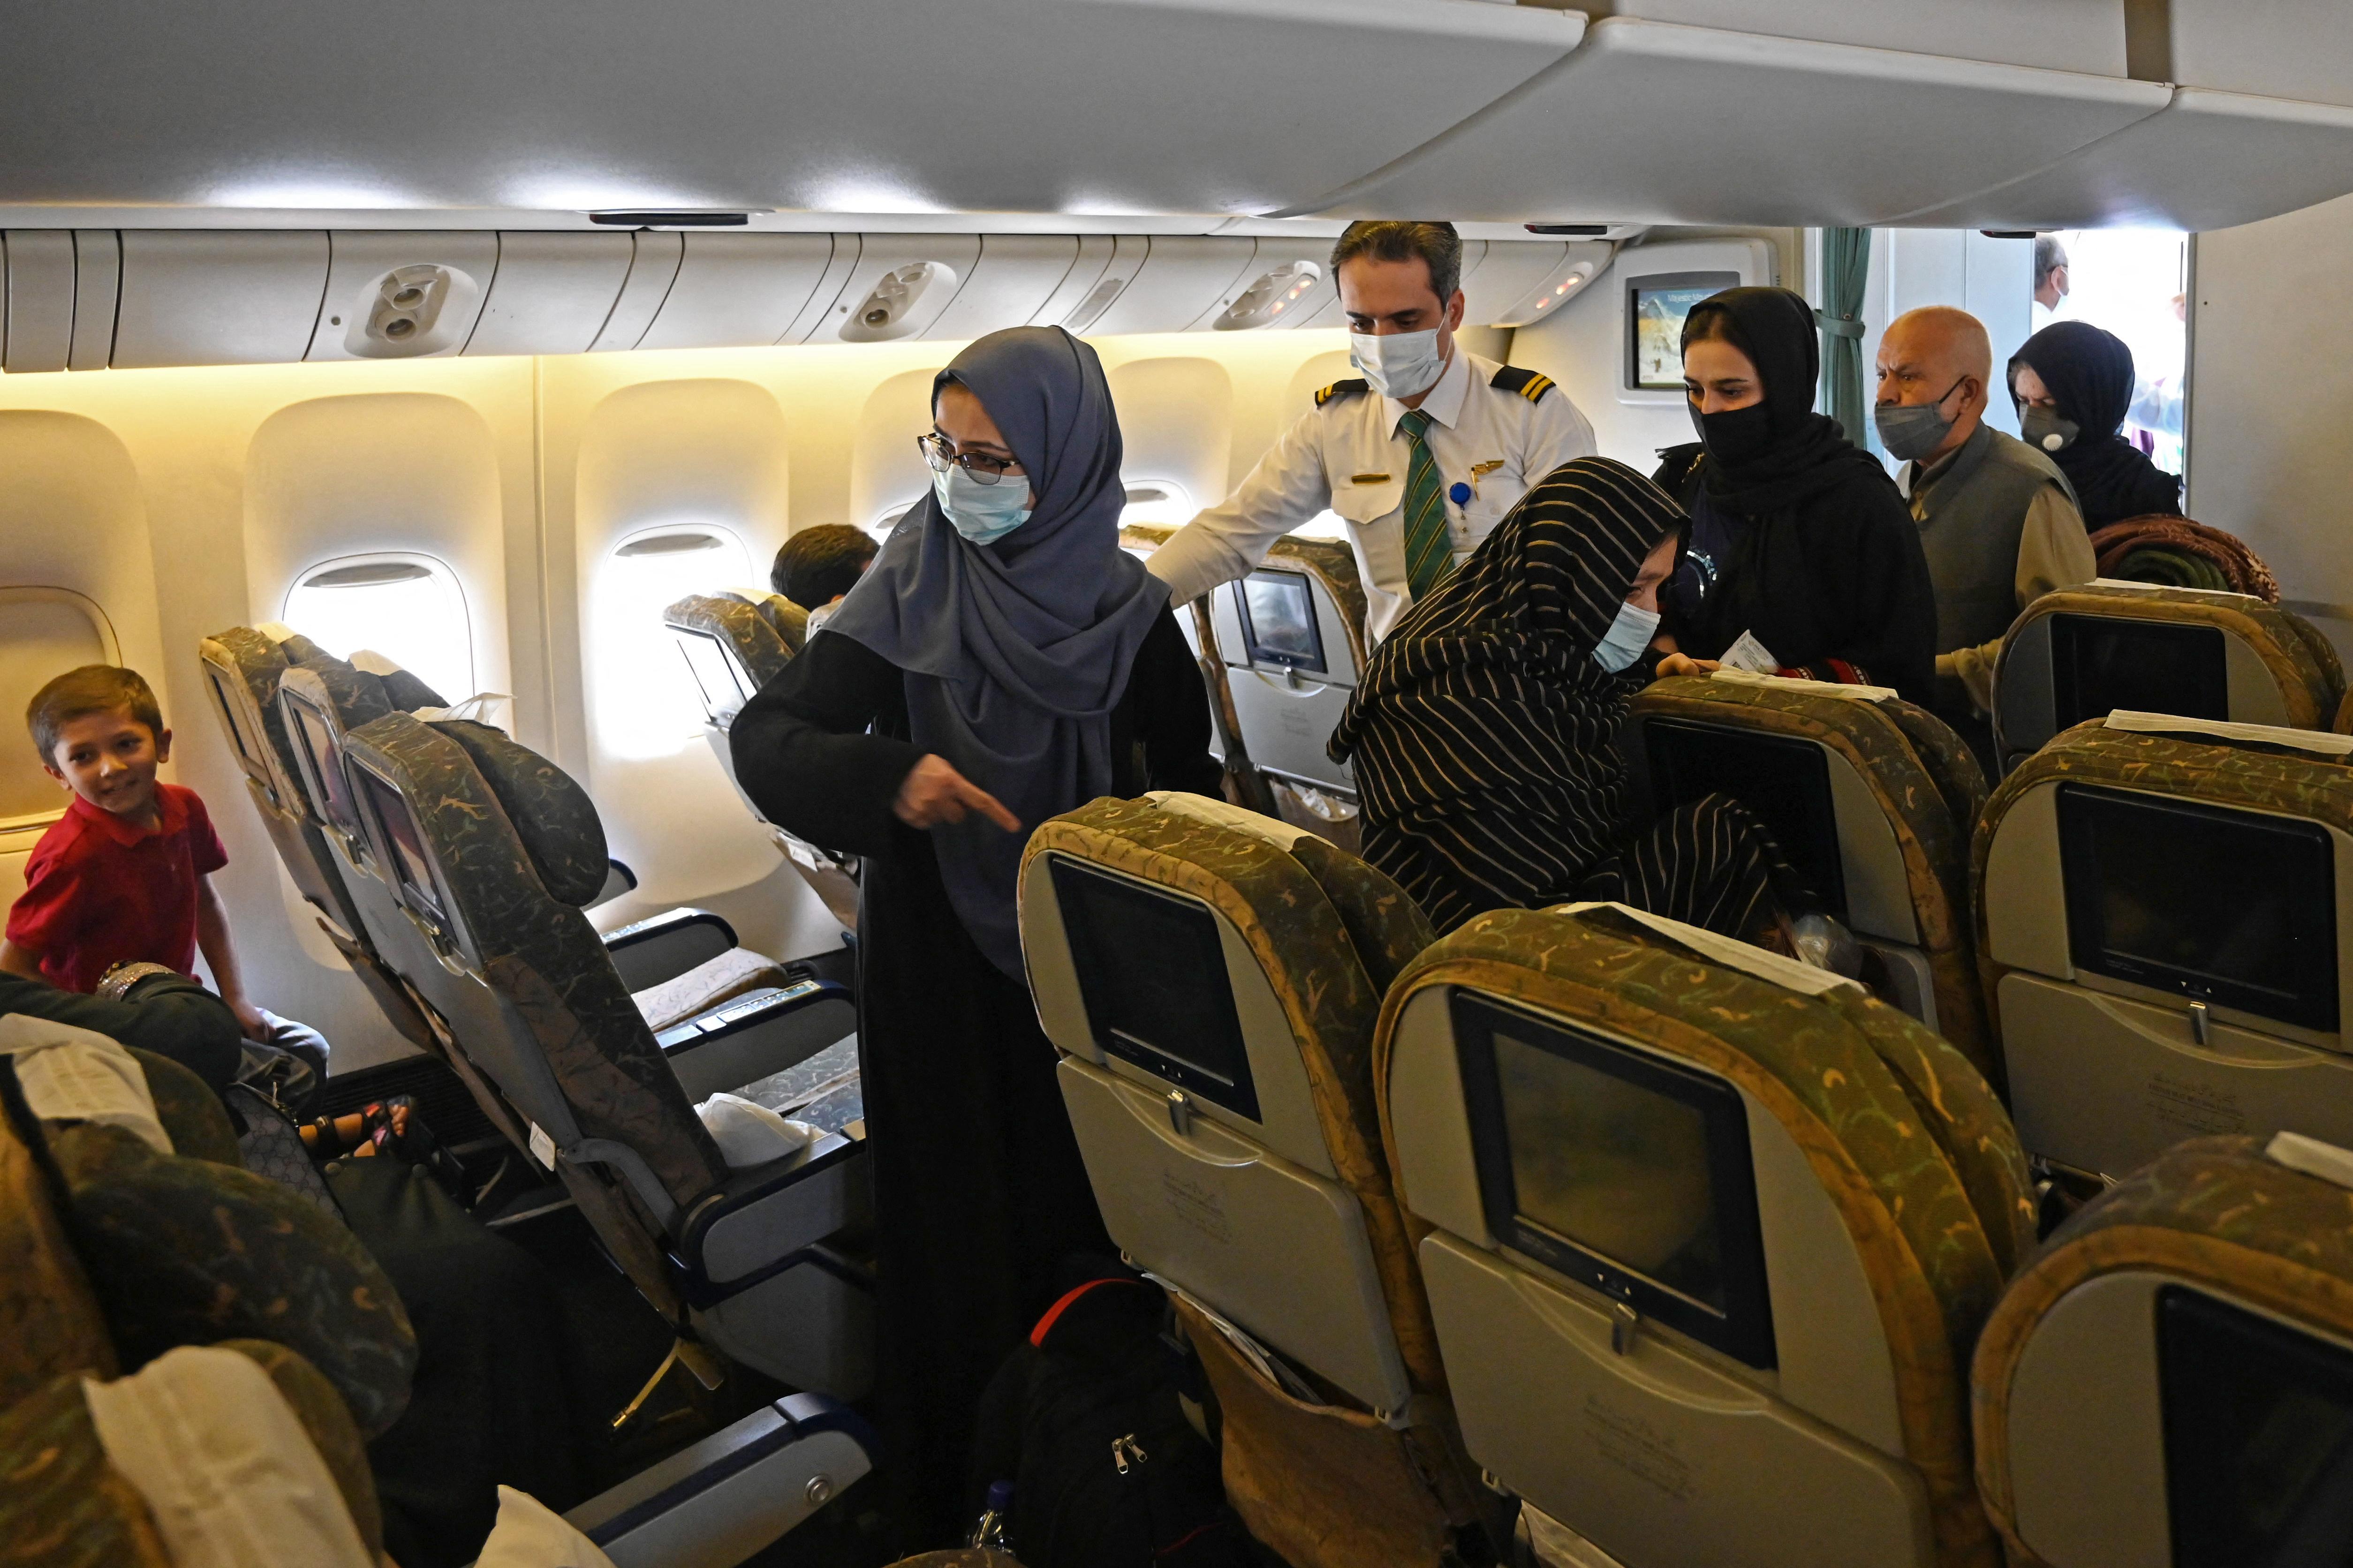 Passageiros a bordo do primeiro voo comercial partindo do aeroporto de Cabul desde a volta do Talibã ao poder (Foto: Aamir QURESHI / AFP)